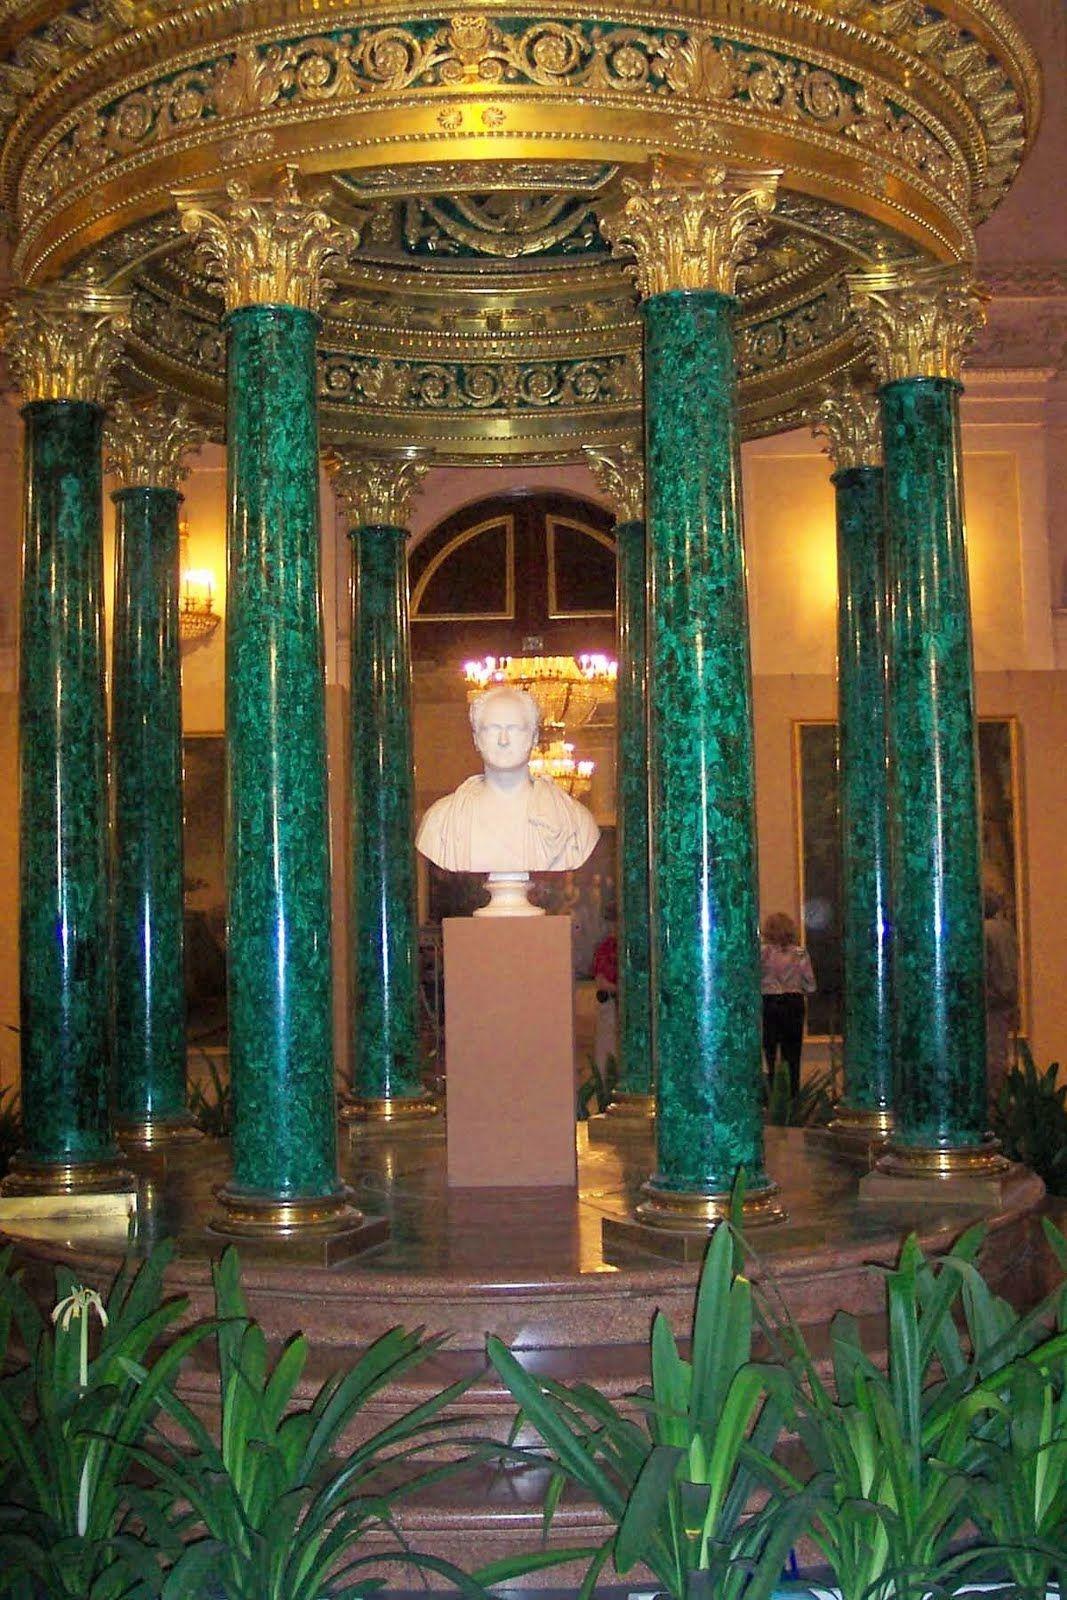 Malachite Room - Hermitage Museum, St. Petersburg, Russia | Vintage ...